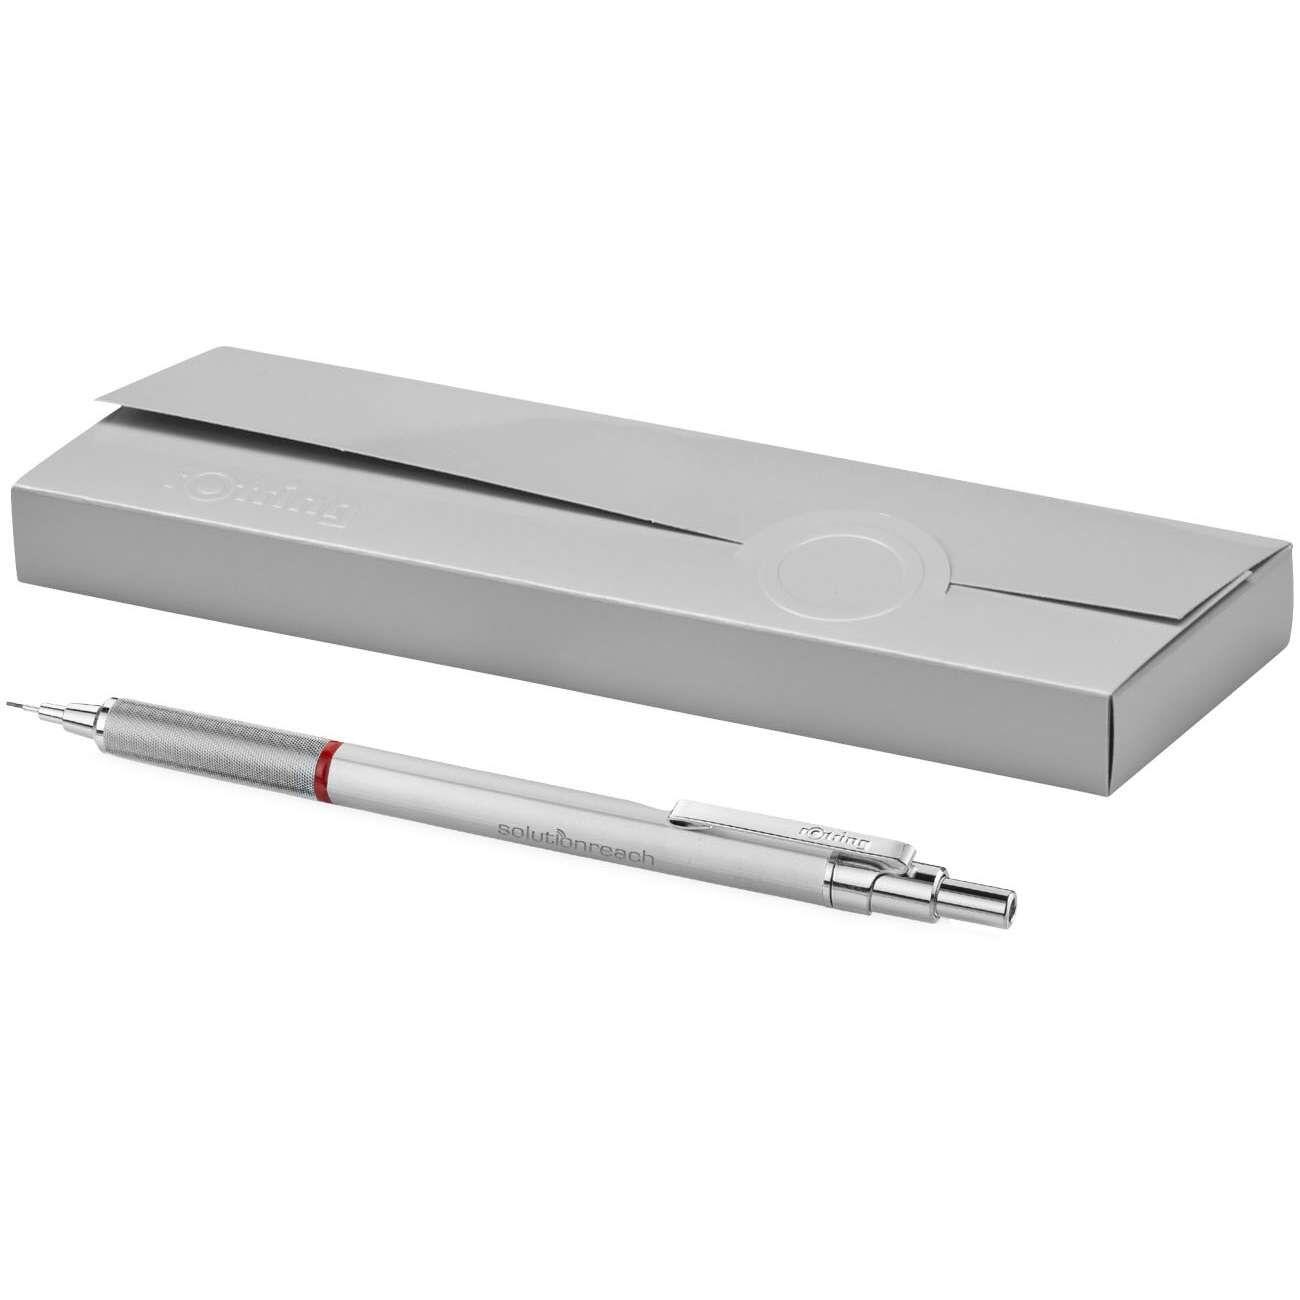 Rotring Rapid Pro Mechanical Pencil